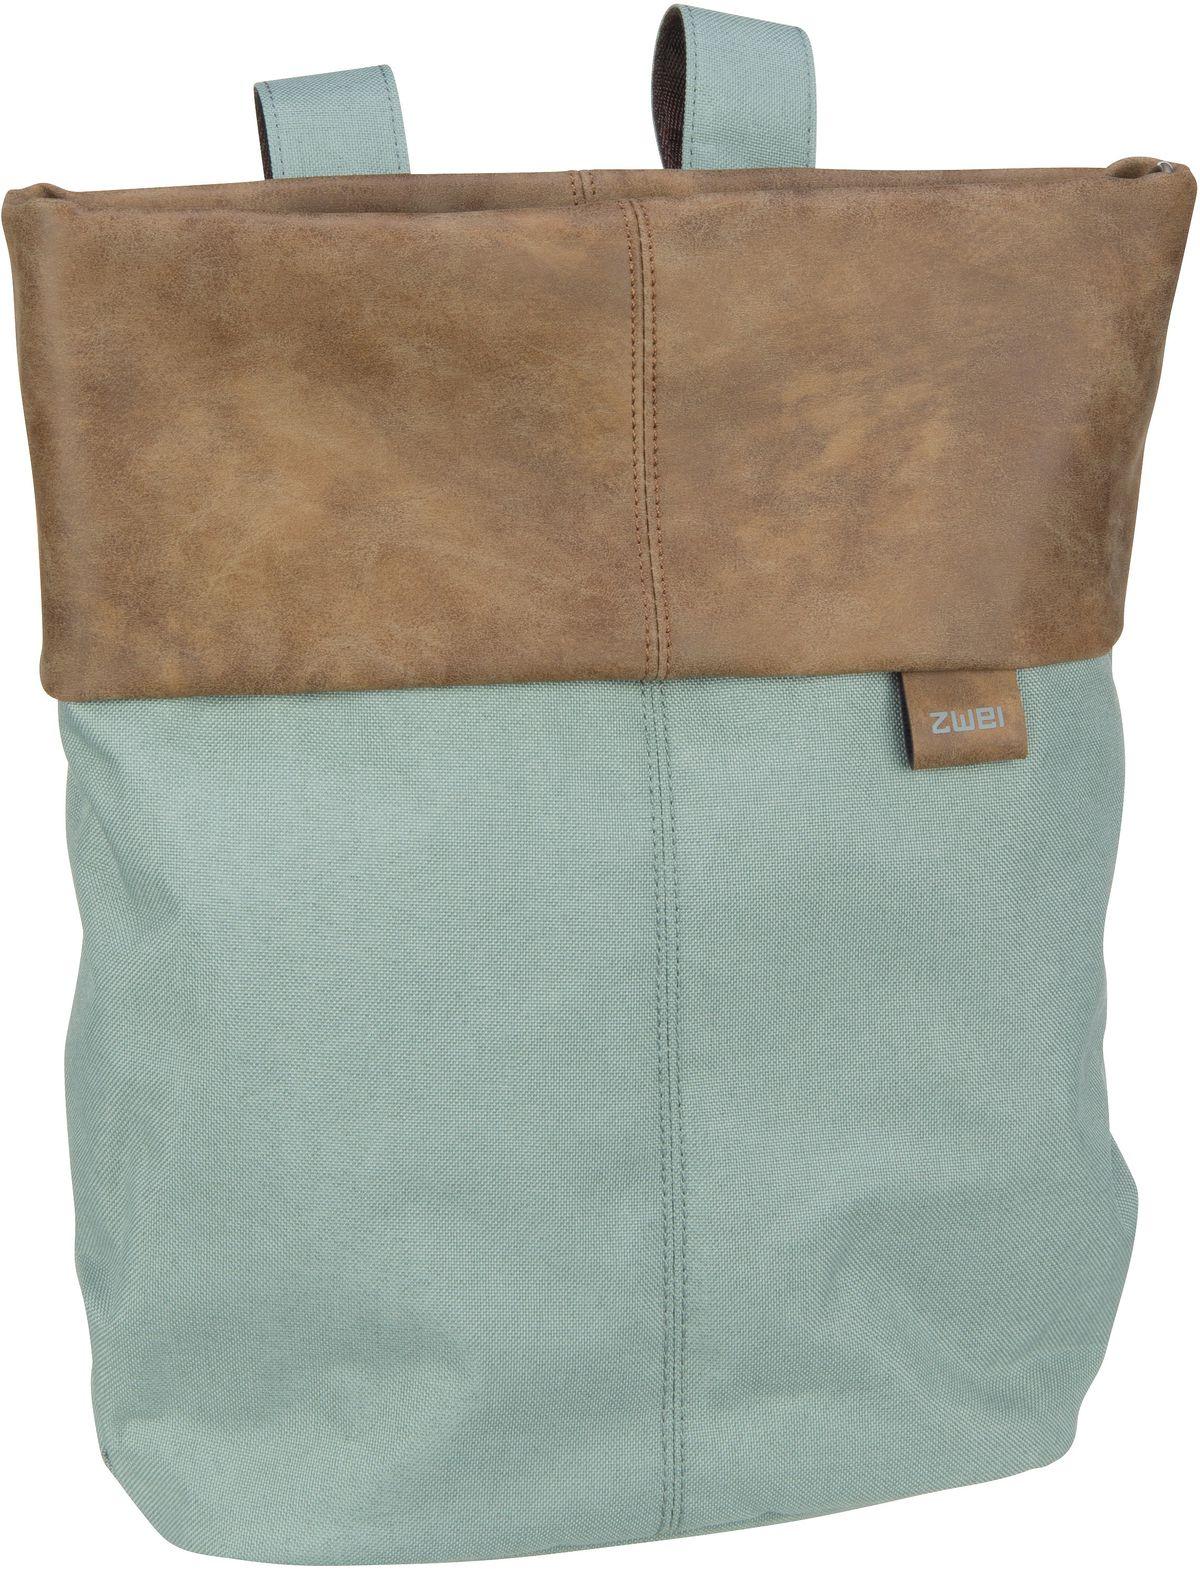 Rucksack / Daypack Olli OR12 Mint